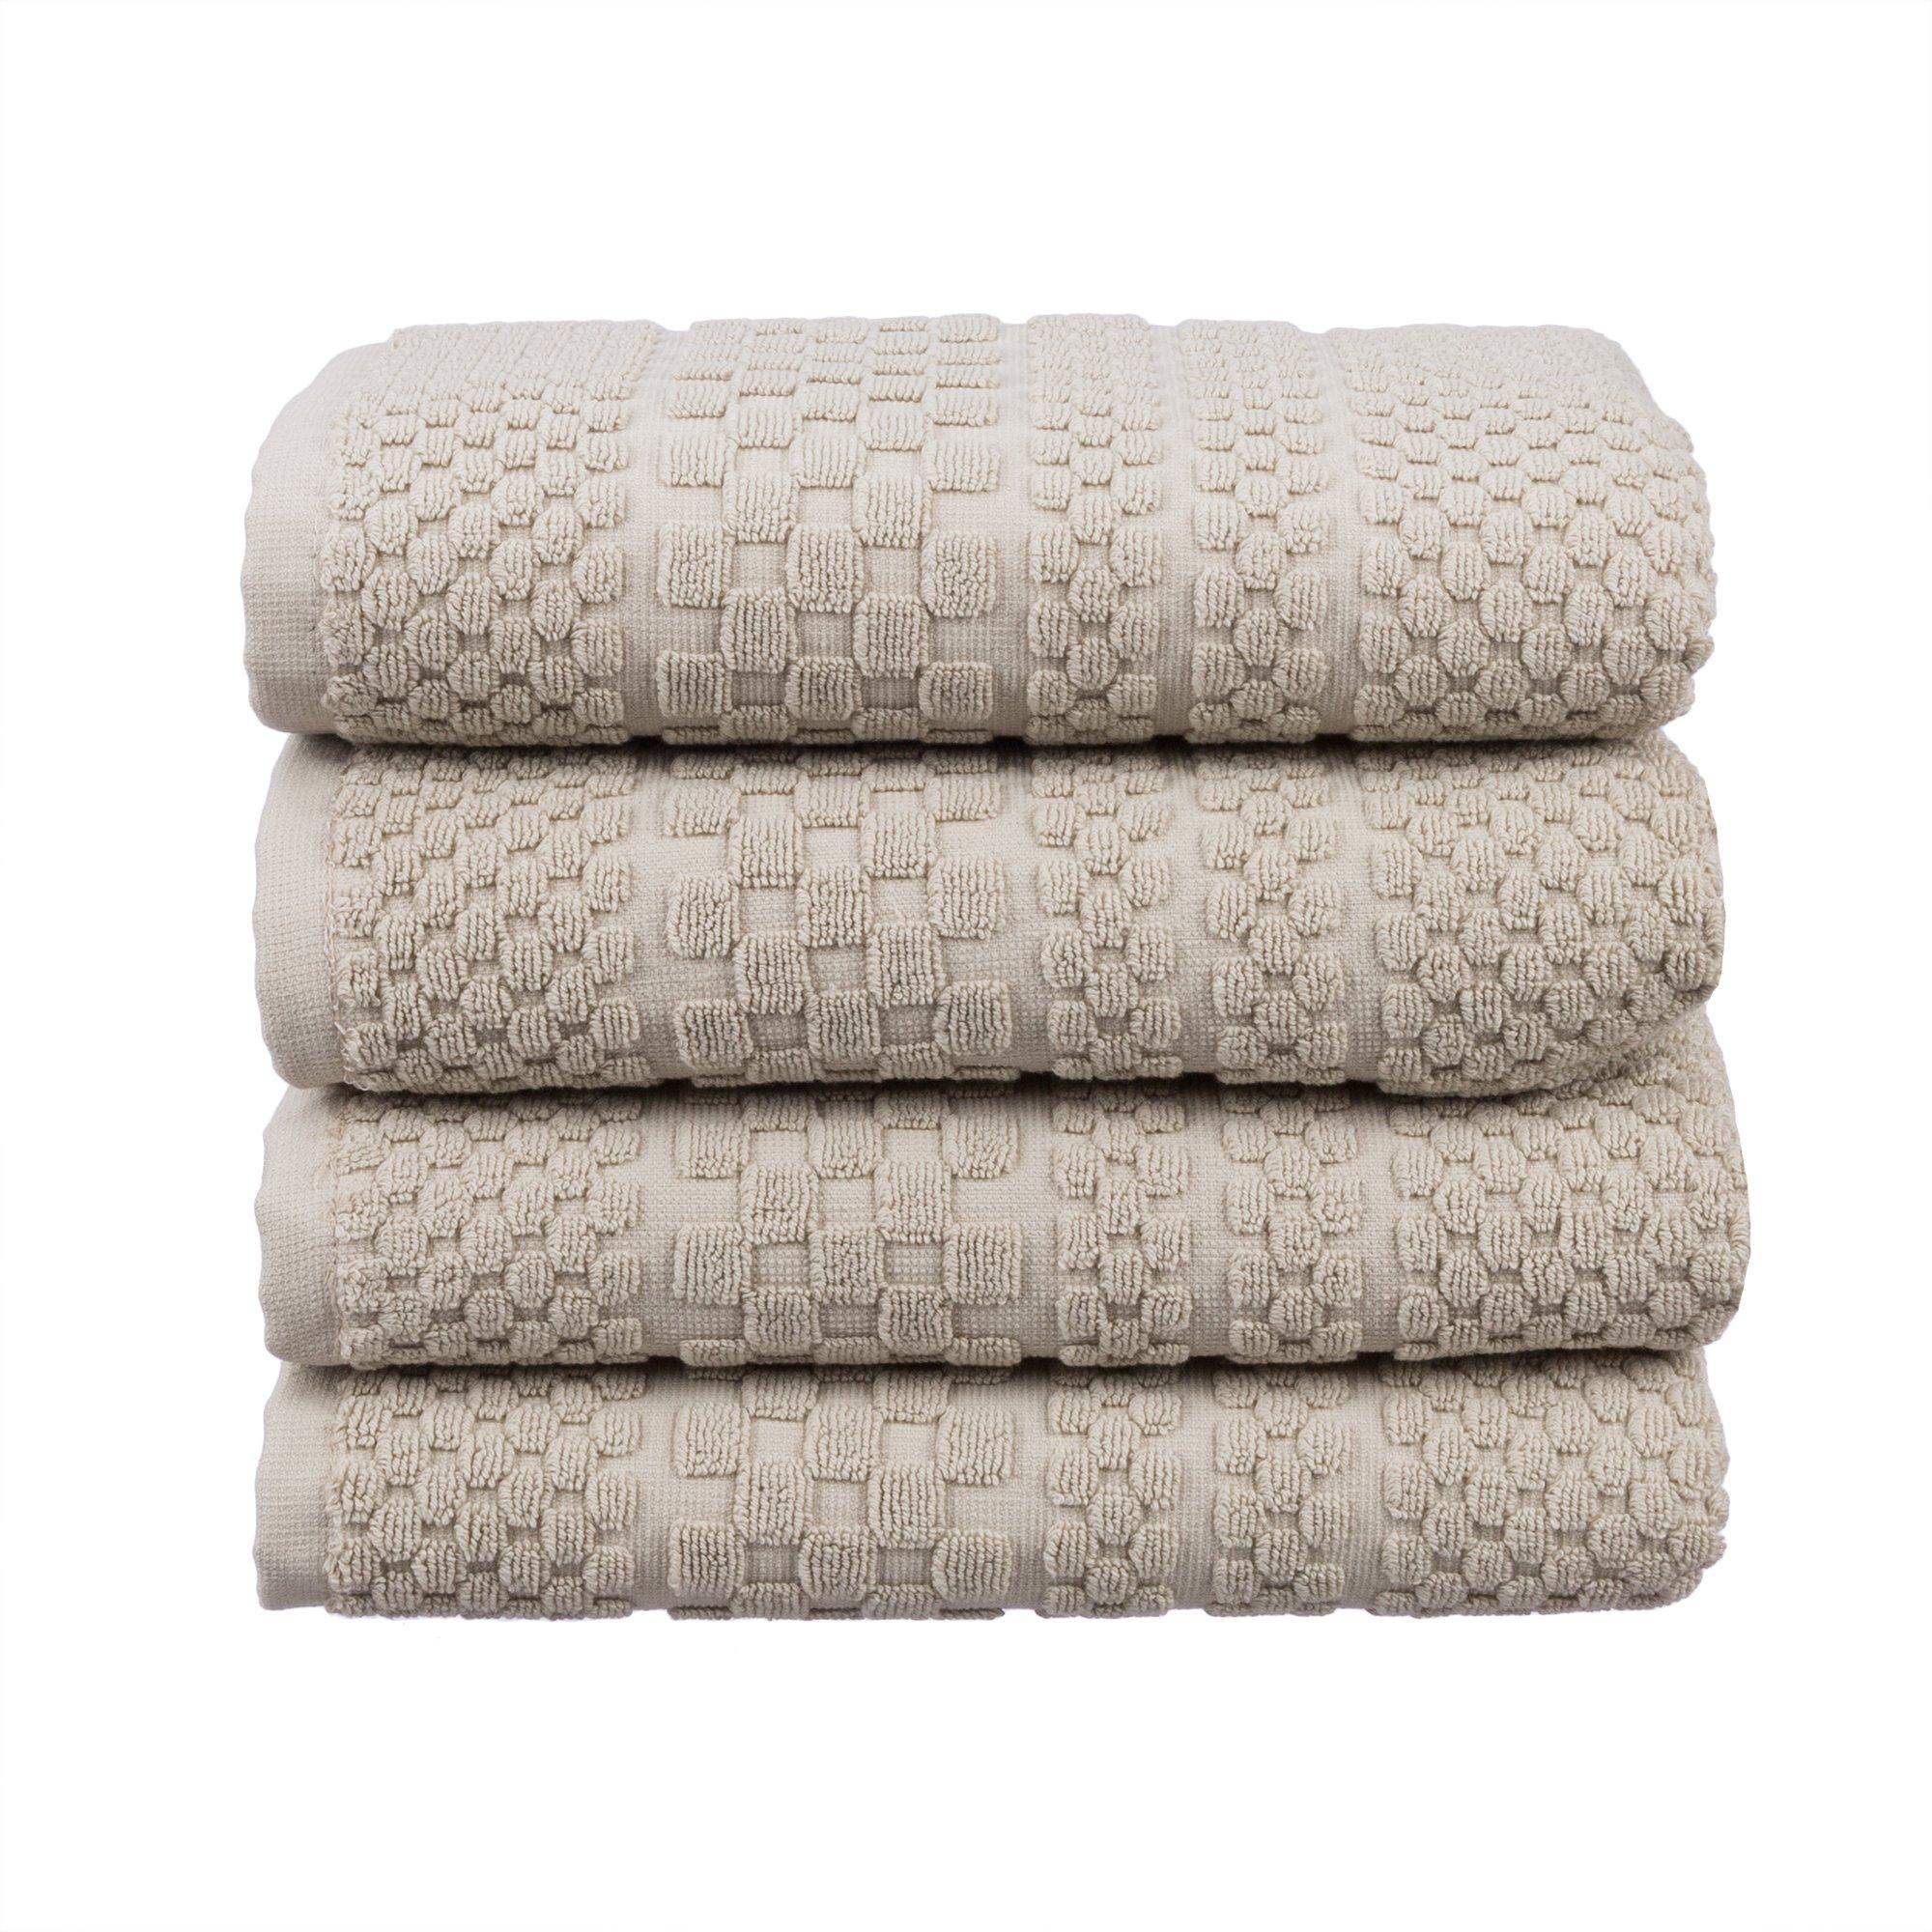 Hobby Home Collection ''Chequers Luxury 100% Turkish Cotton Luxury Hotel & SPA Double Yard Ultra Absorbent & Ultra Soft Ottoman Elegance Design Turkish Bathroom 4-Piece Hand Towel Set (4 x Beige)